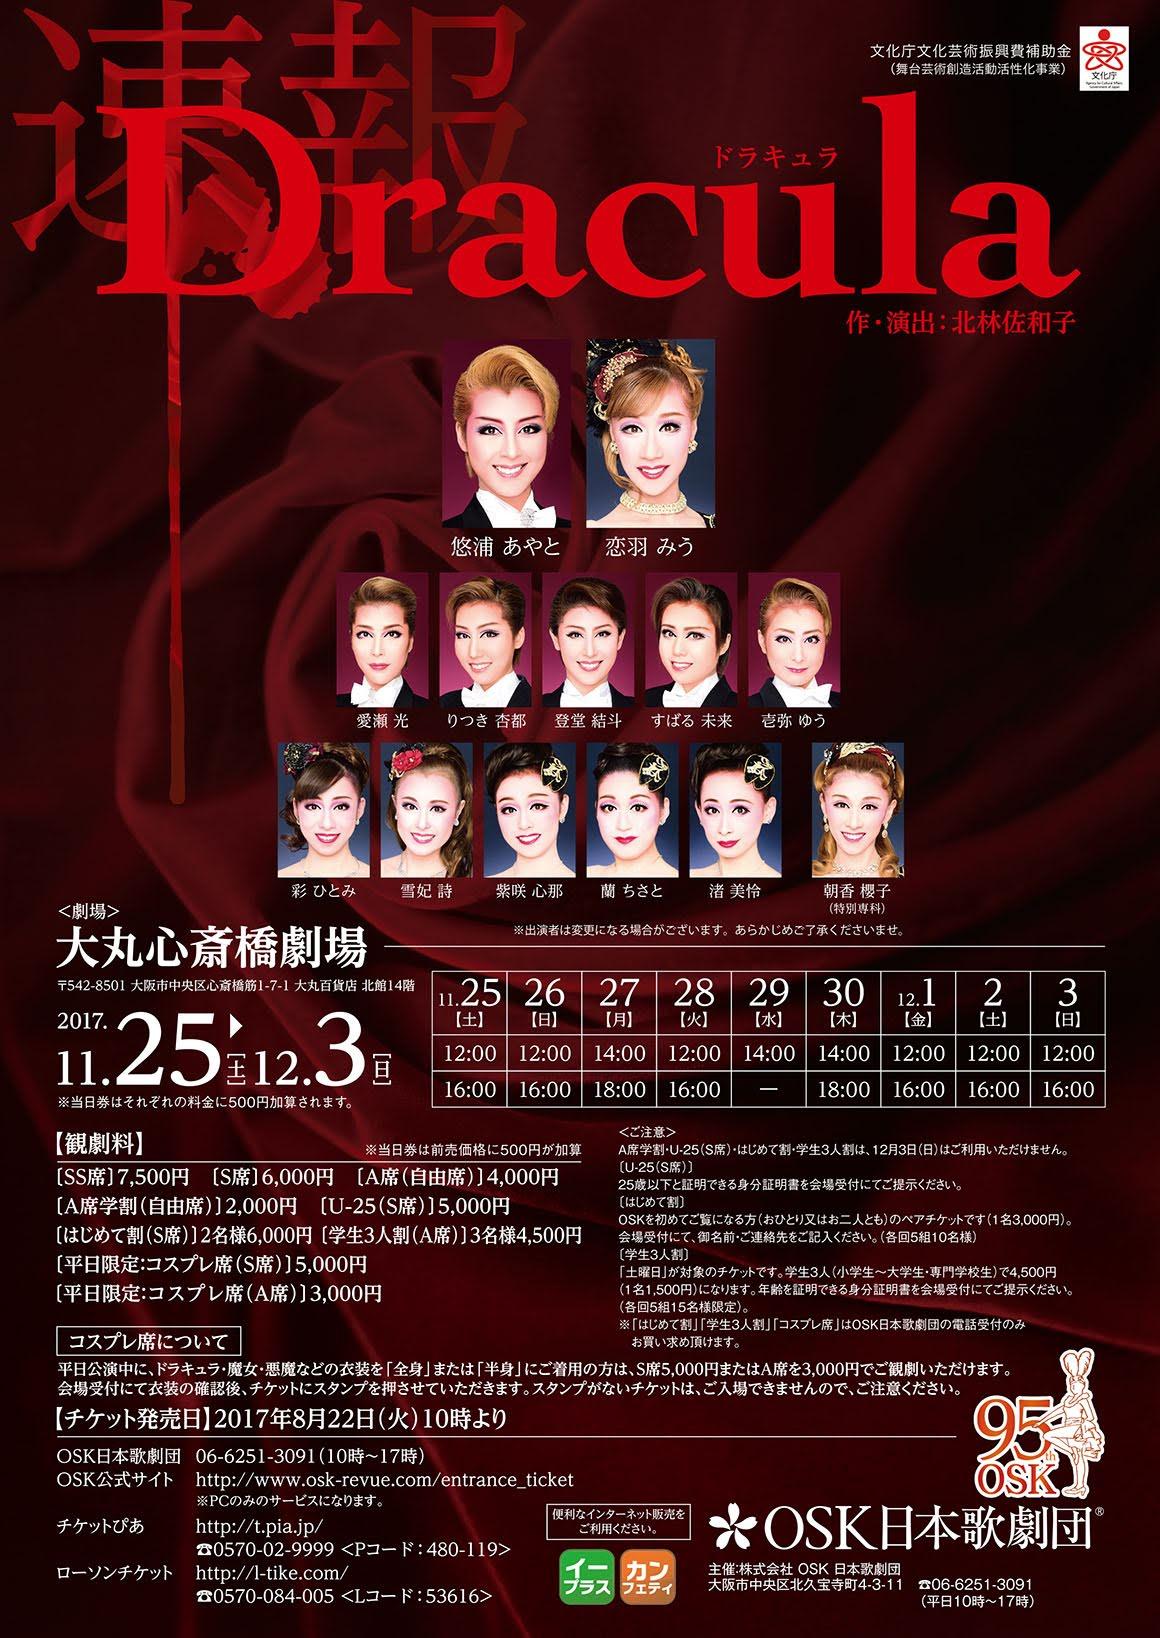 【2017-11-25】OSK-Doracula_裏.jpg